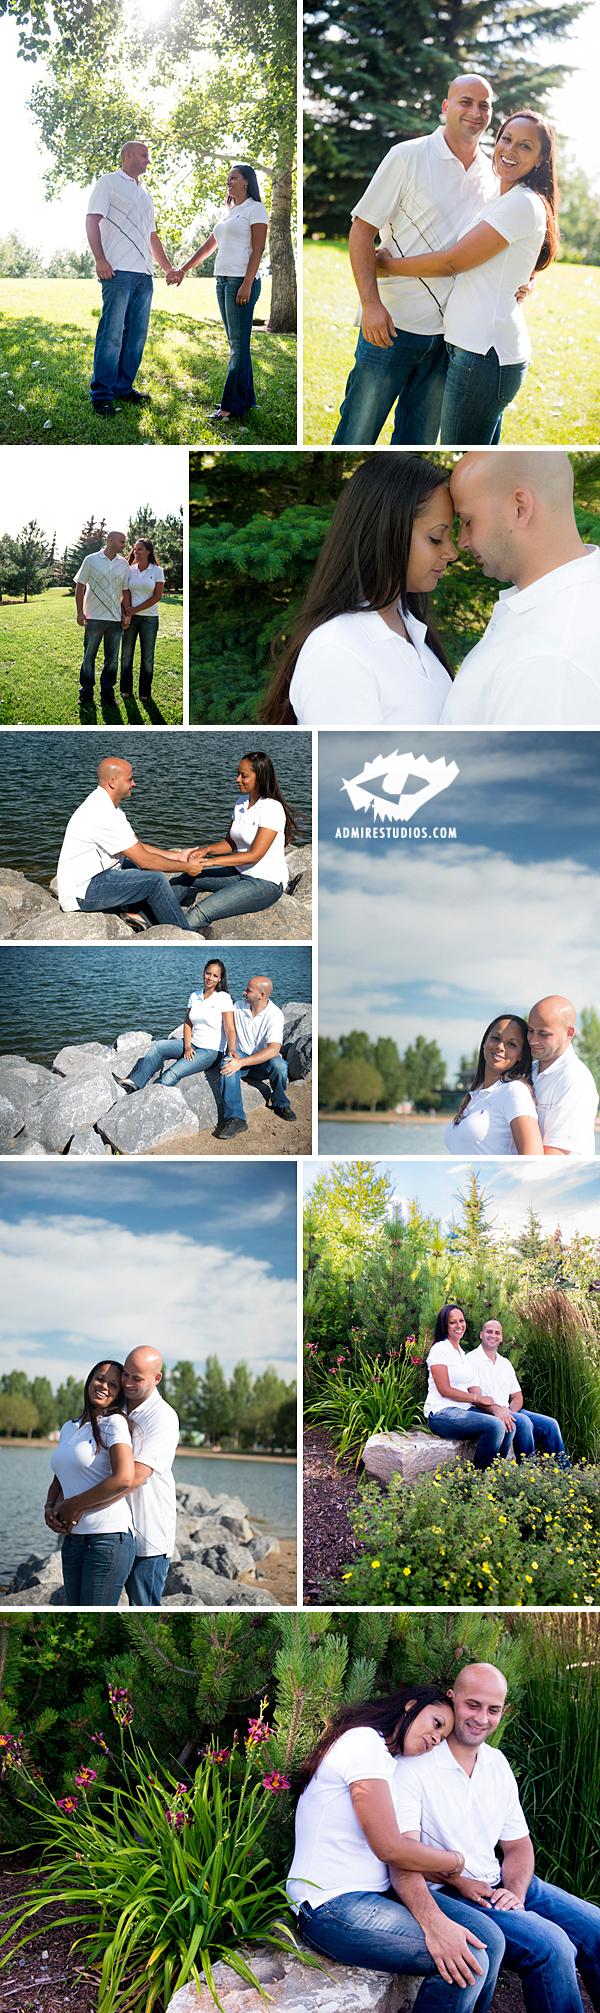 calgary engagement photos